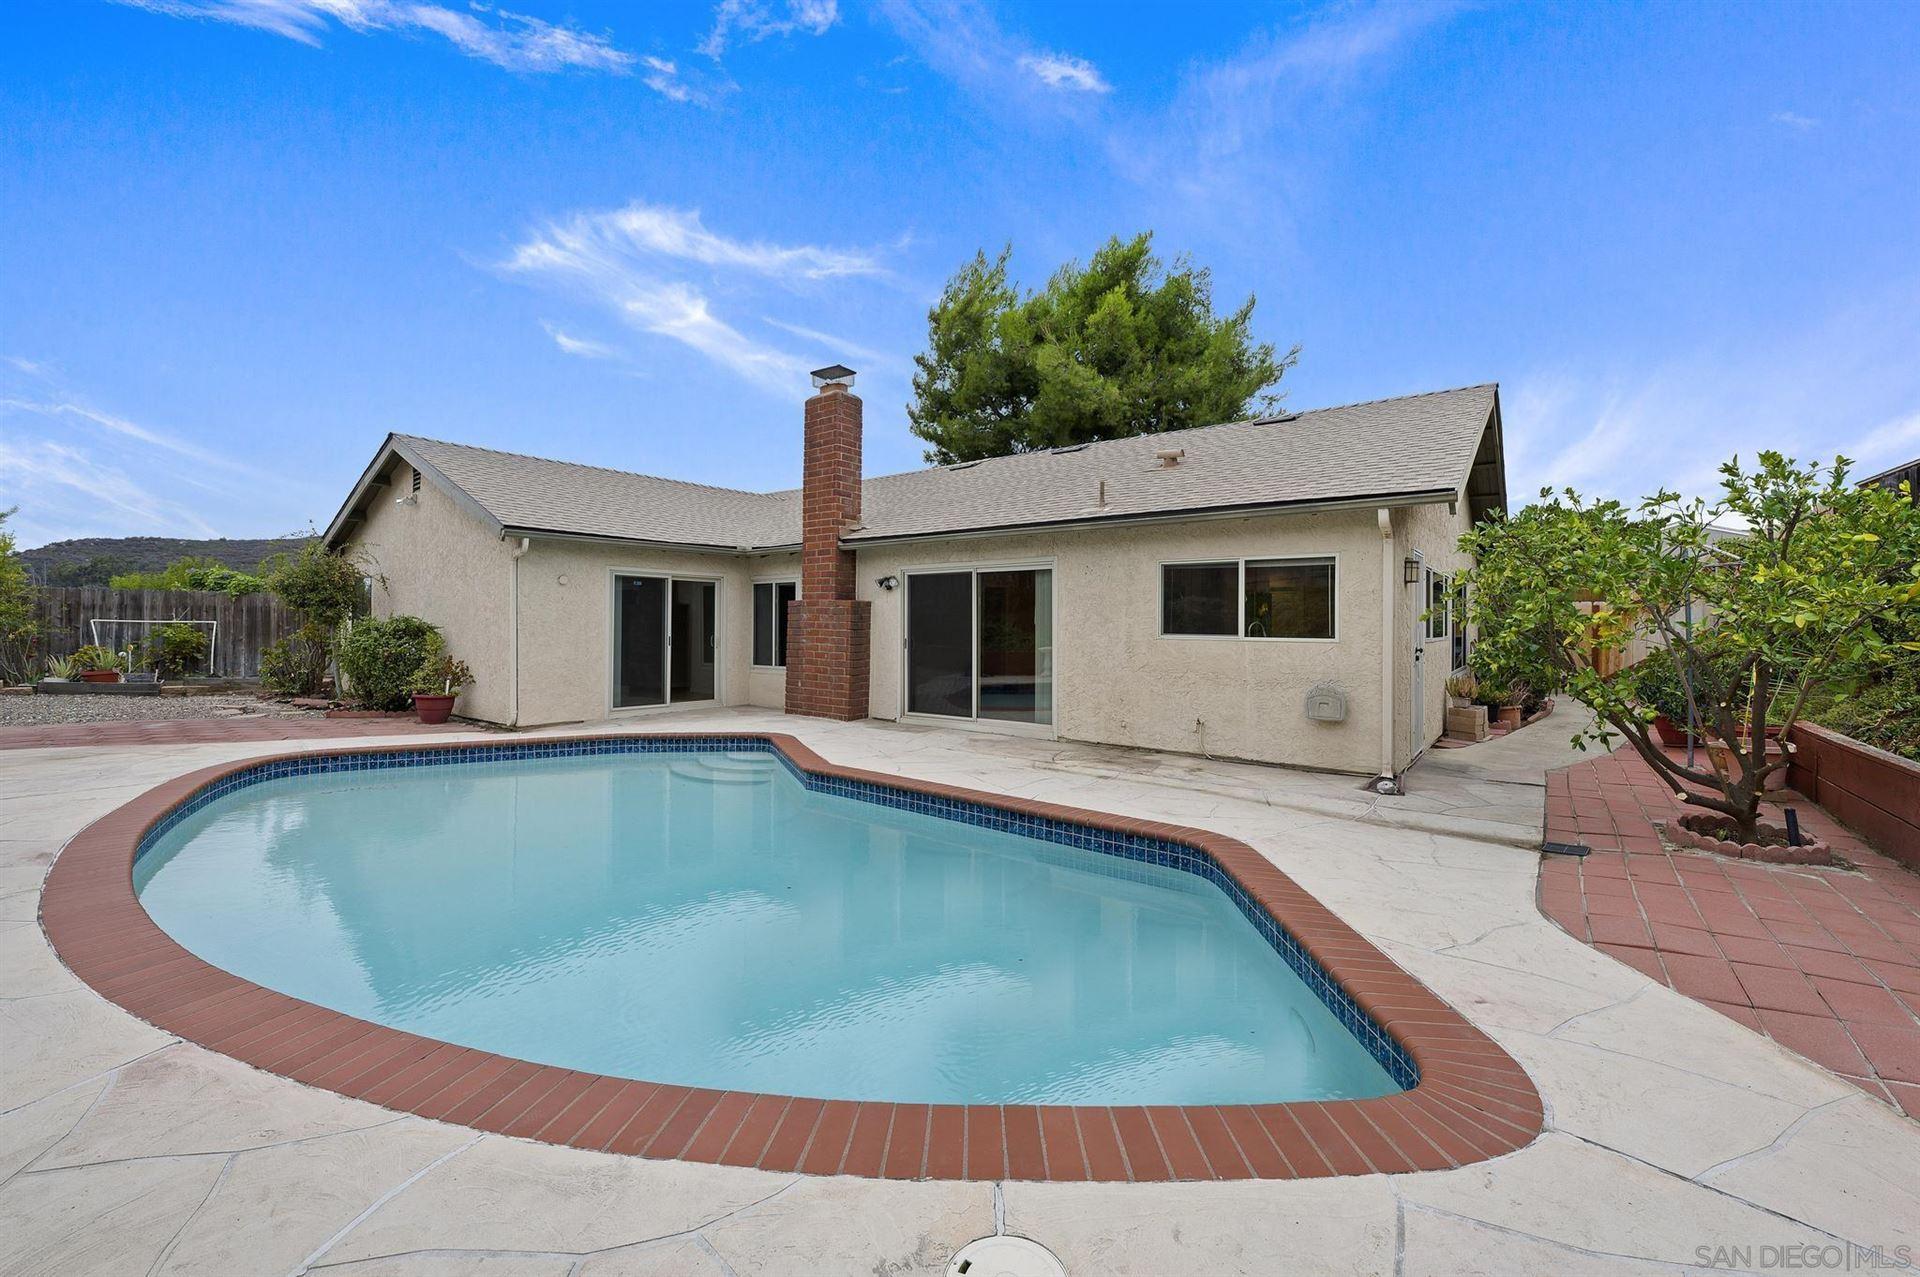 Photo of 12443 McFeron Rd, Poway, CA 92064 (MLS # 210028410)